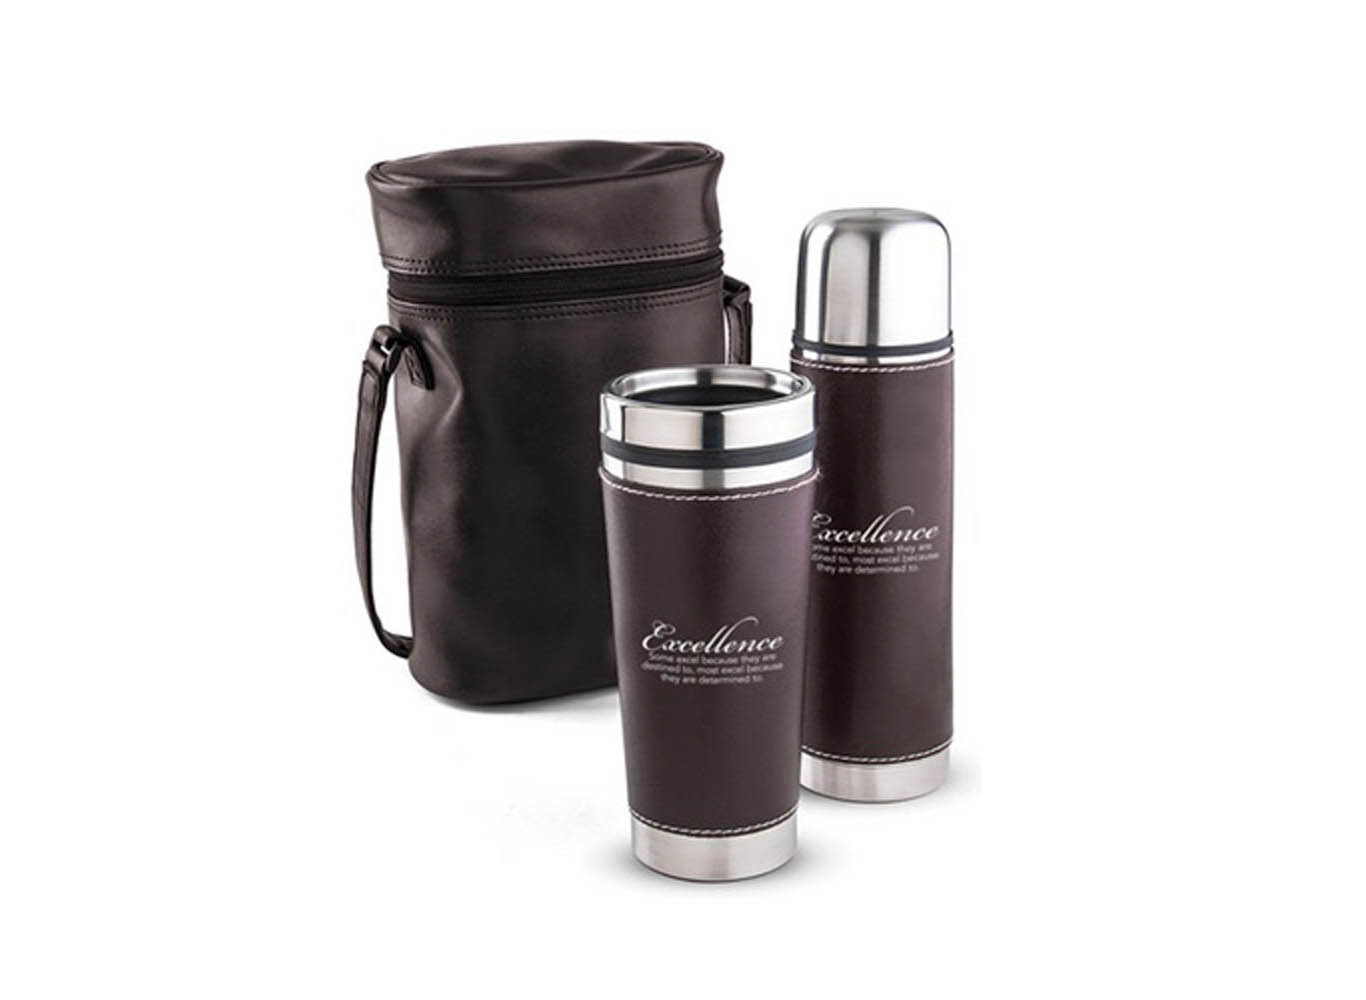 Custom Leather Vacuum Insulated Thermal Flask, Tumbler Bag Set